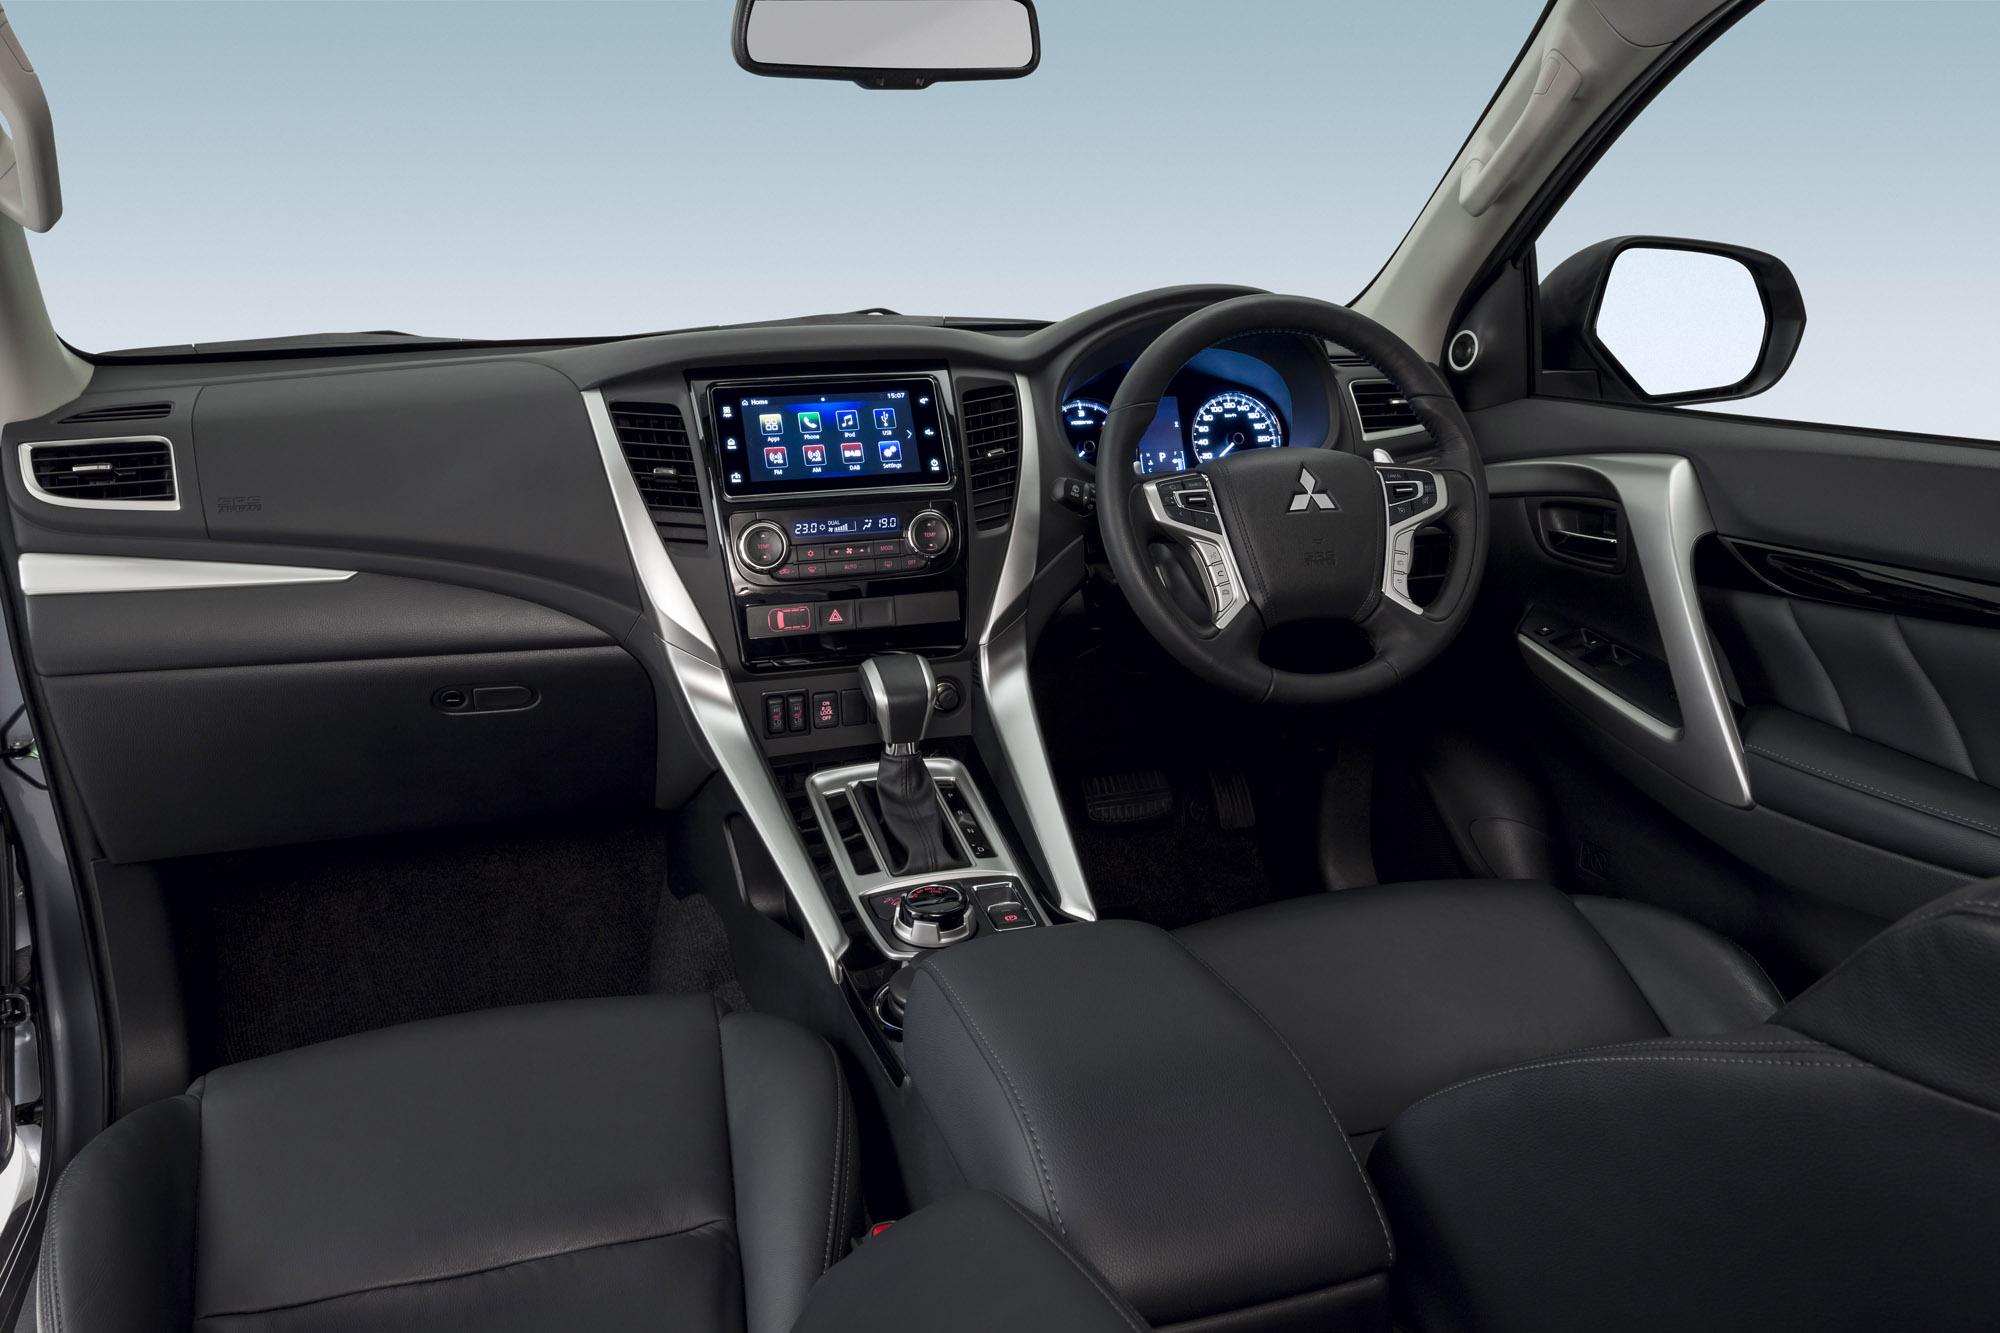 2016 Mitsubishi Pajero Sport Dashboard Interior